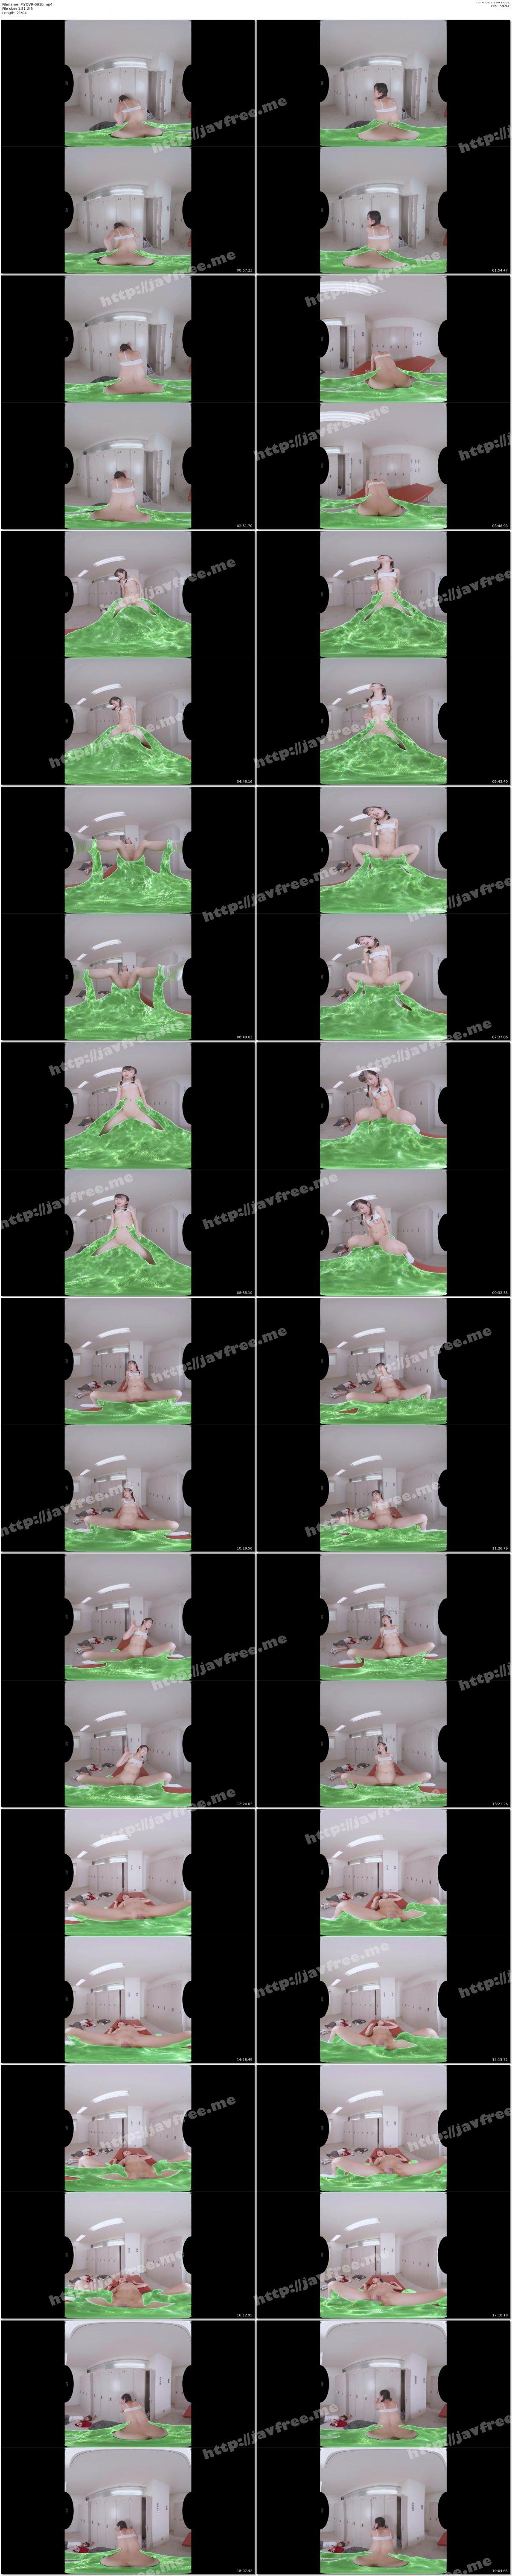 [PIYOVR-001] 【VR】透明人間VR~これって仮想!?現実!?透明人間になって更衣室でひよこ女子にやりたい放題!!~※AVOP-470連動作品 - image PIYOVR-001b on https://javfree.me